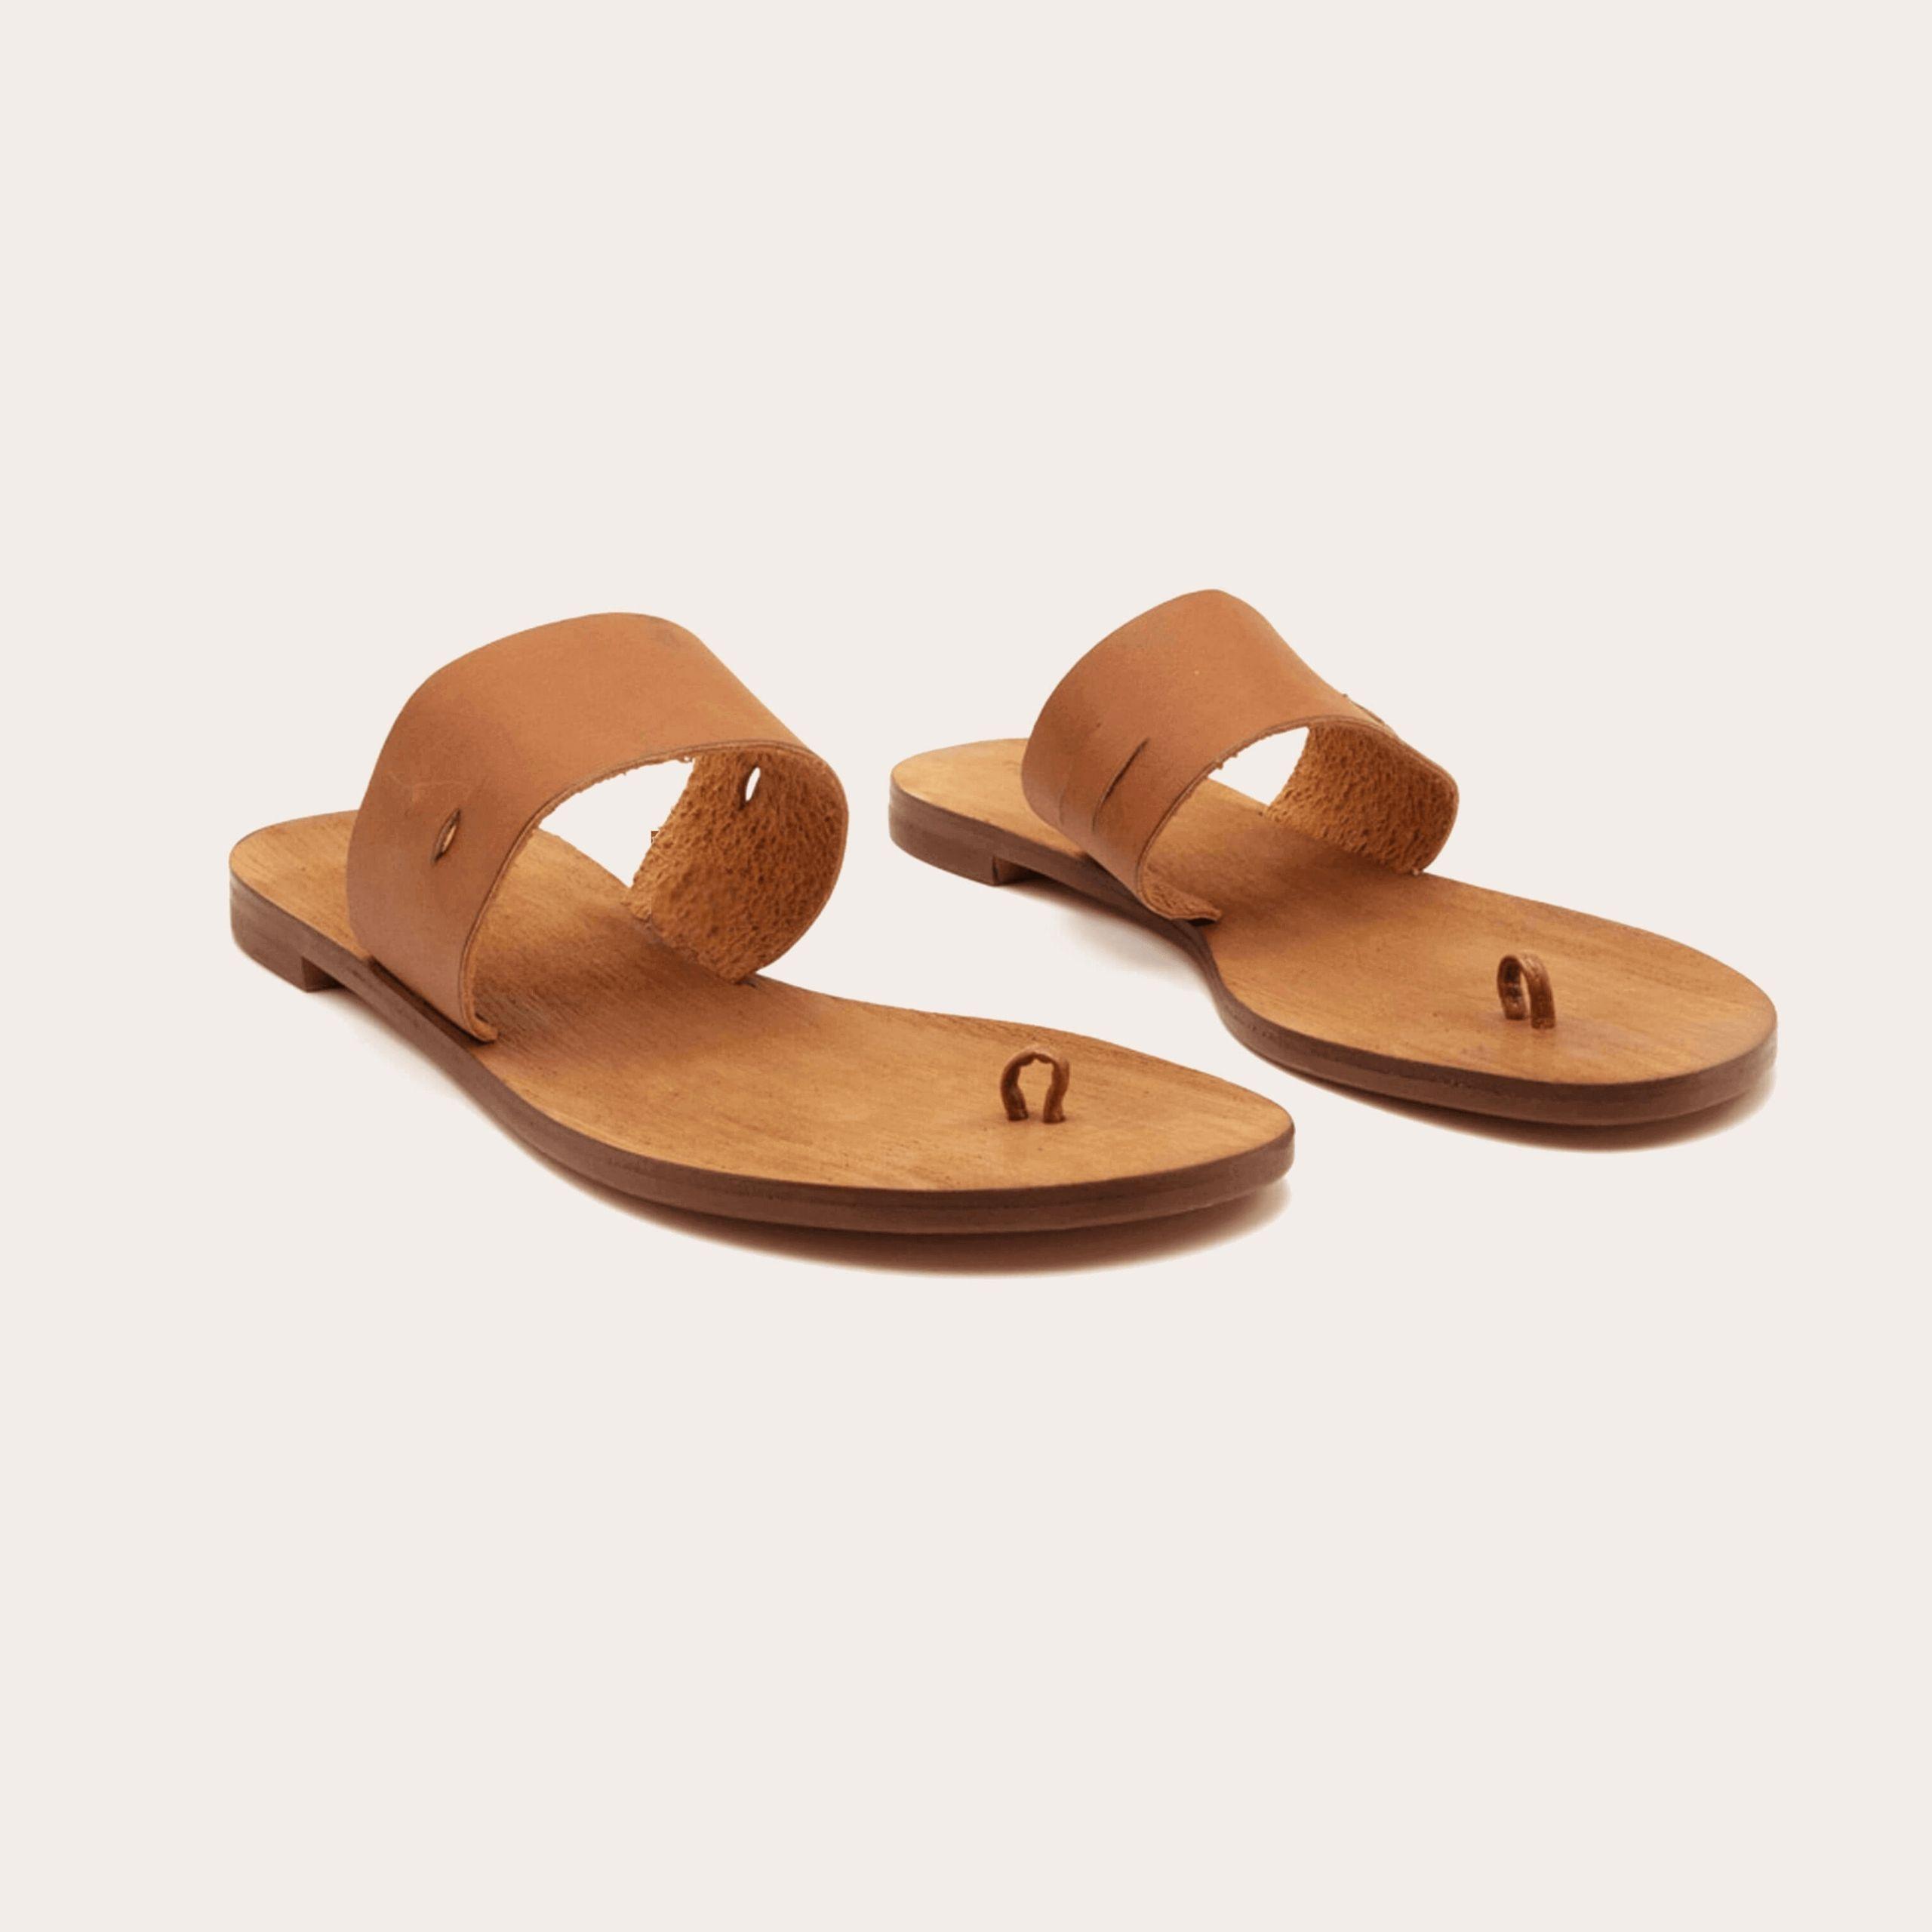 cabo_2_lintsandalen sandals travelsandals vegan sustainable sandals wikkelsandalen